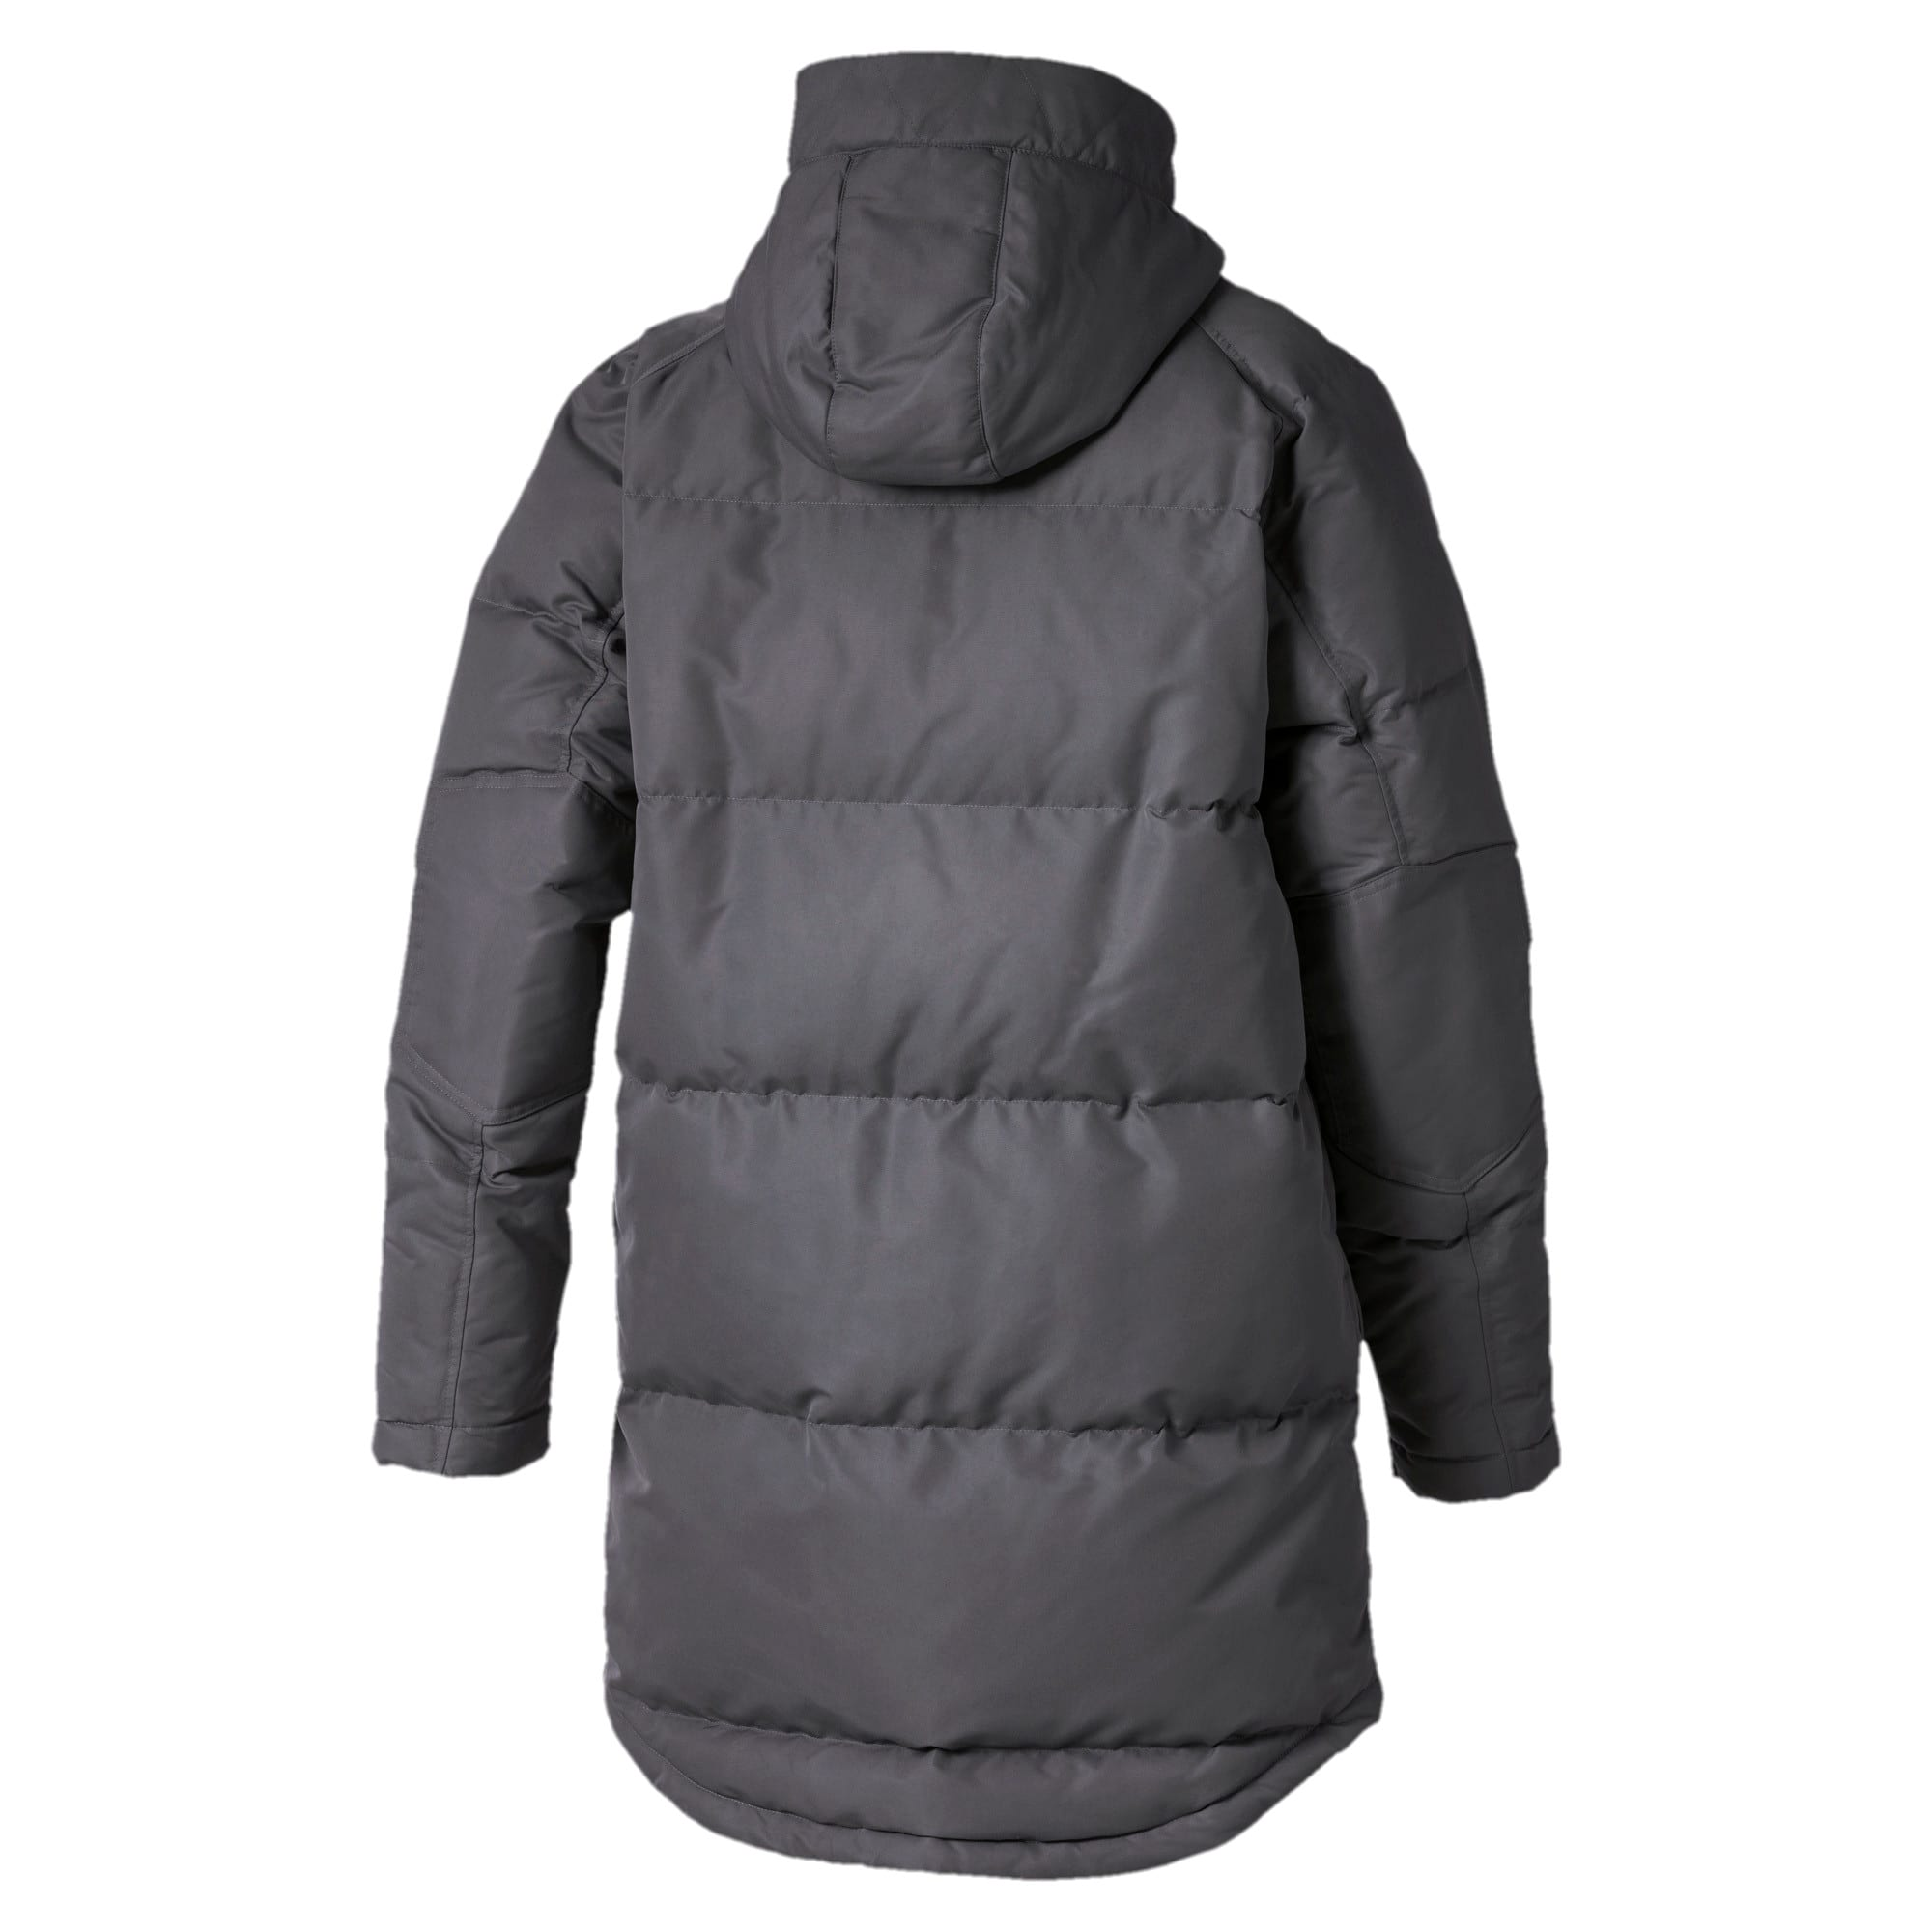 Thumbnail 5 of Oversize 500 Down Hooded Men's Jacket, CASTLEROCK, medium